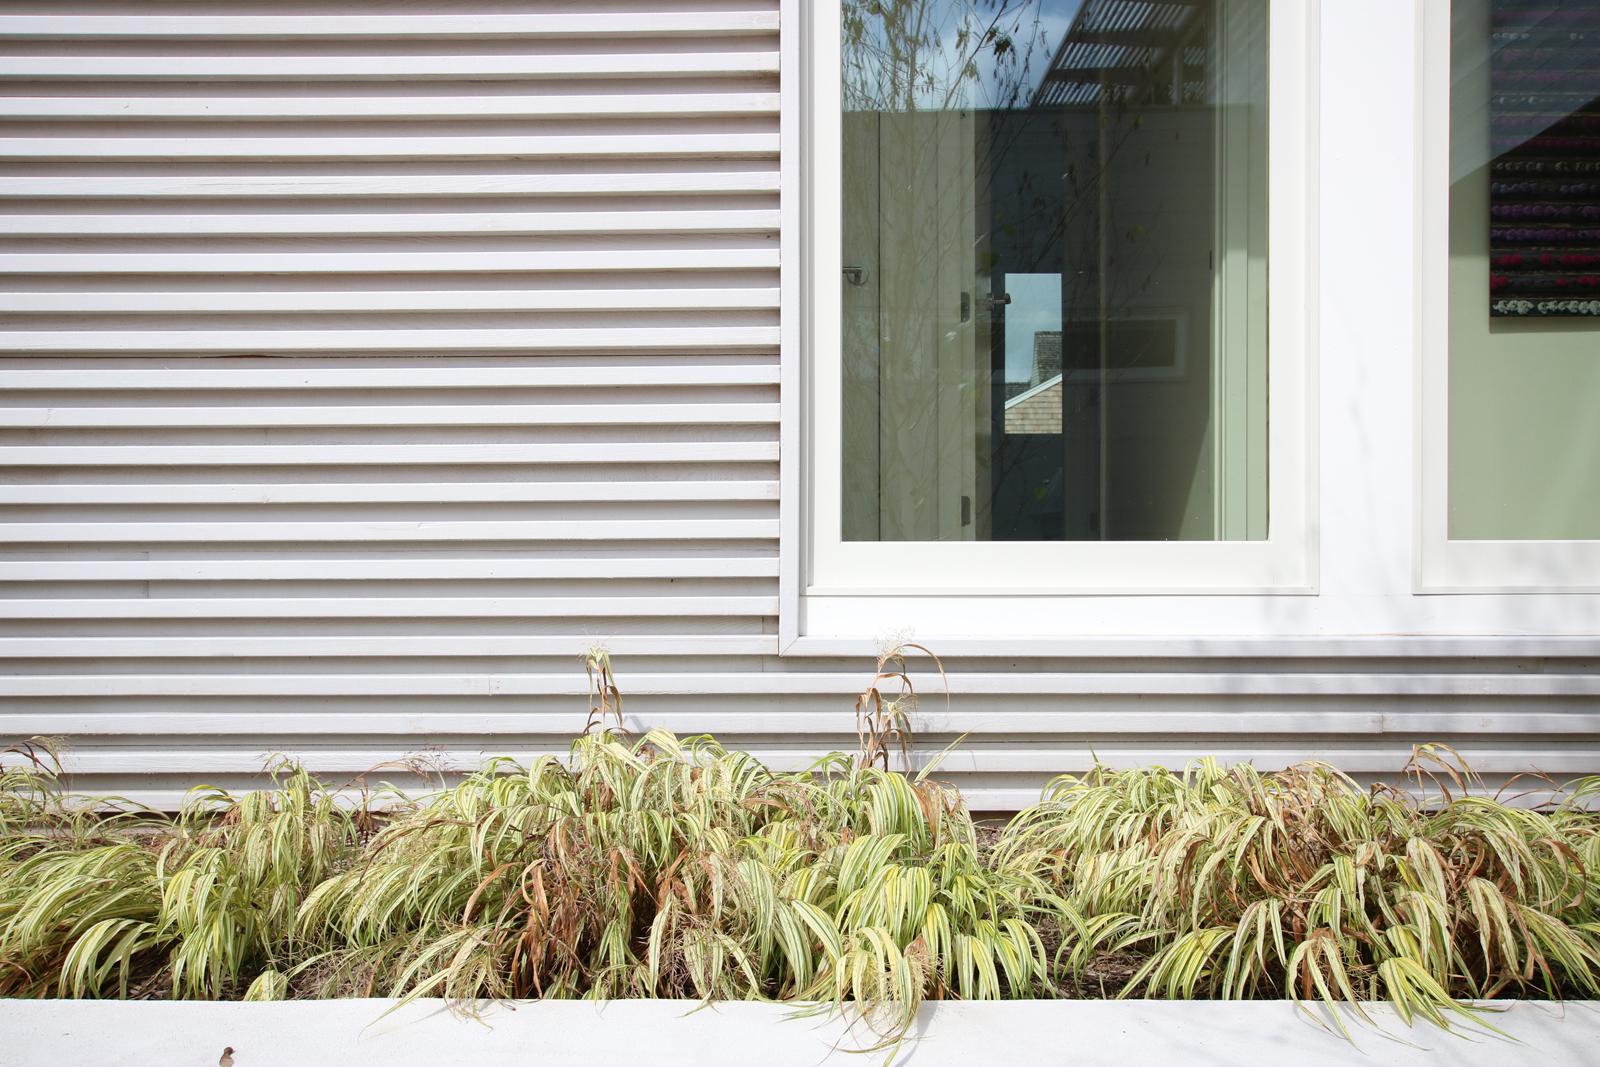 4-re4a-resolution-4-architecture-modern-modular-prefab-bridgehampton house-exterior.jpg